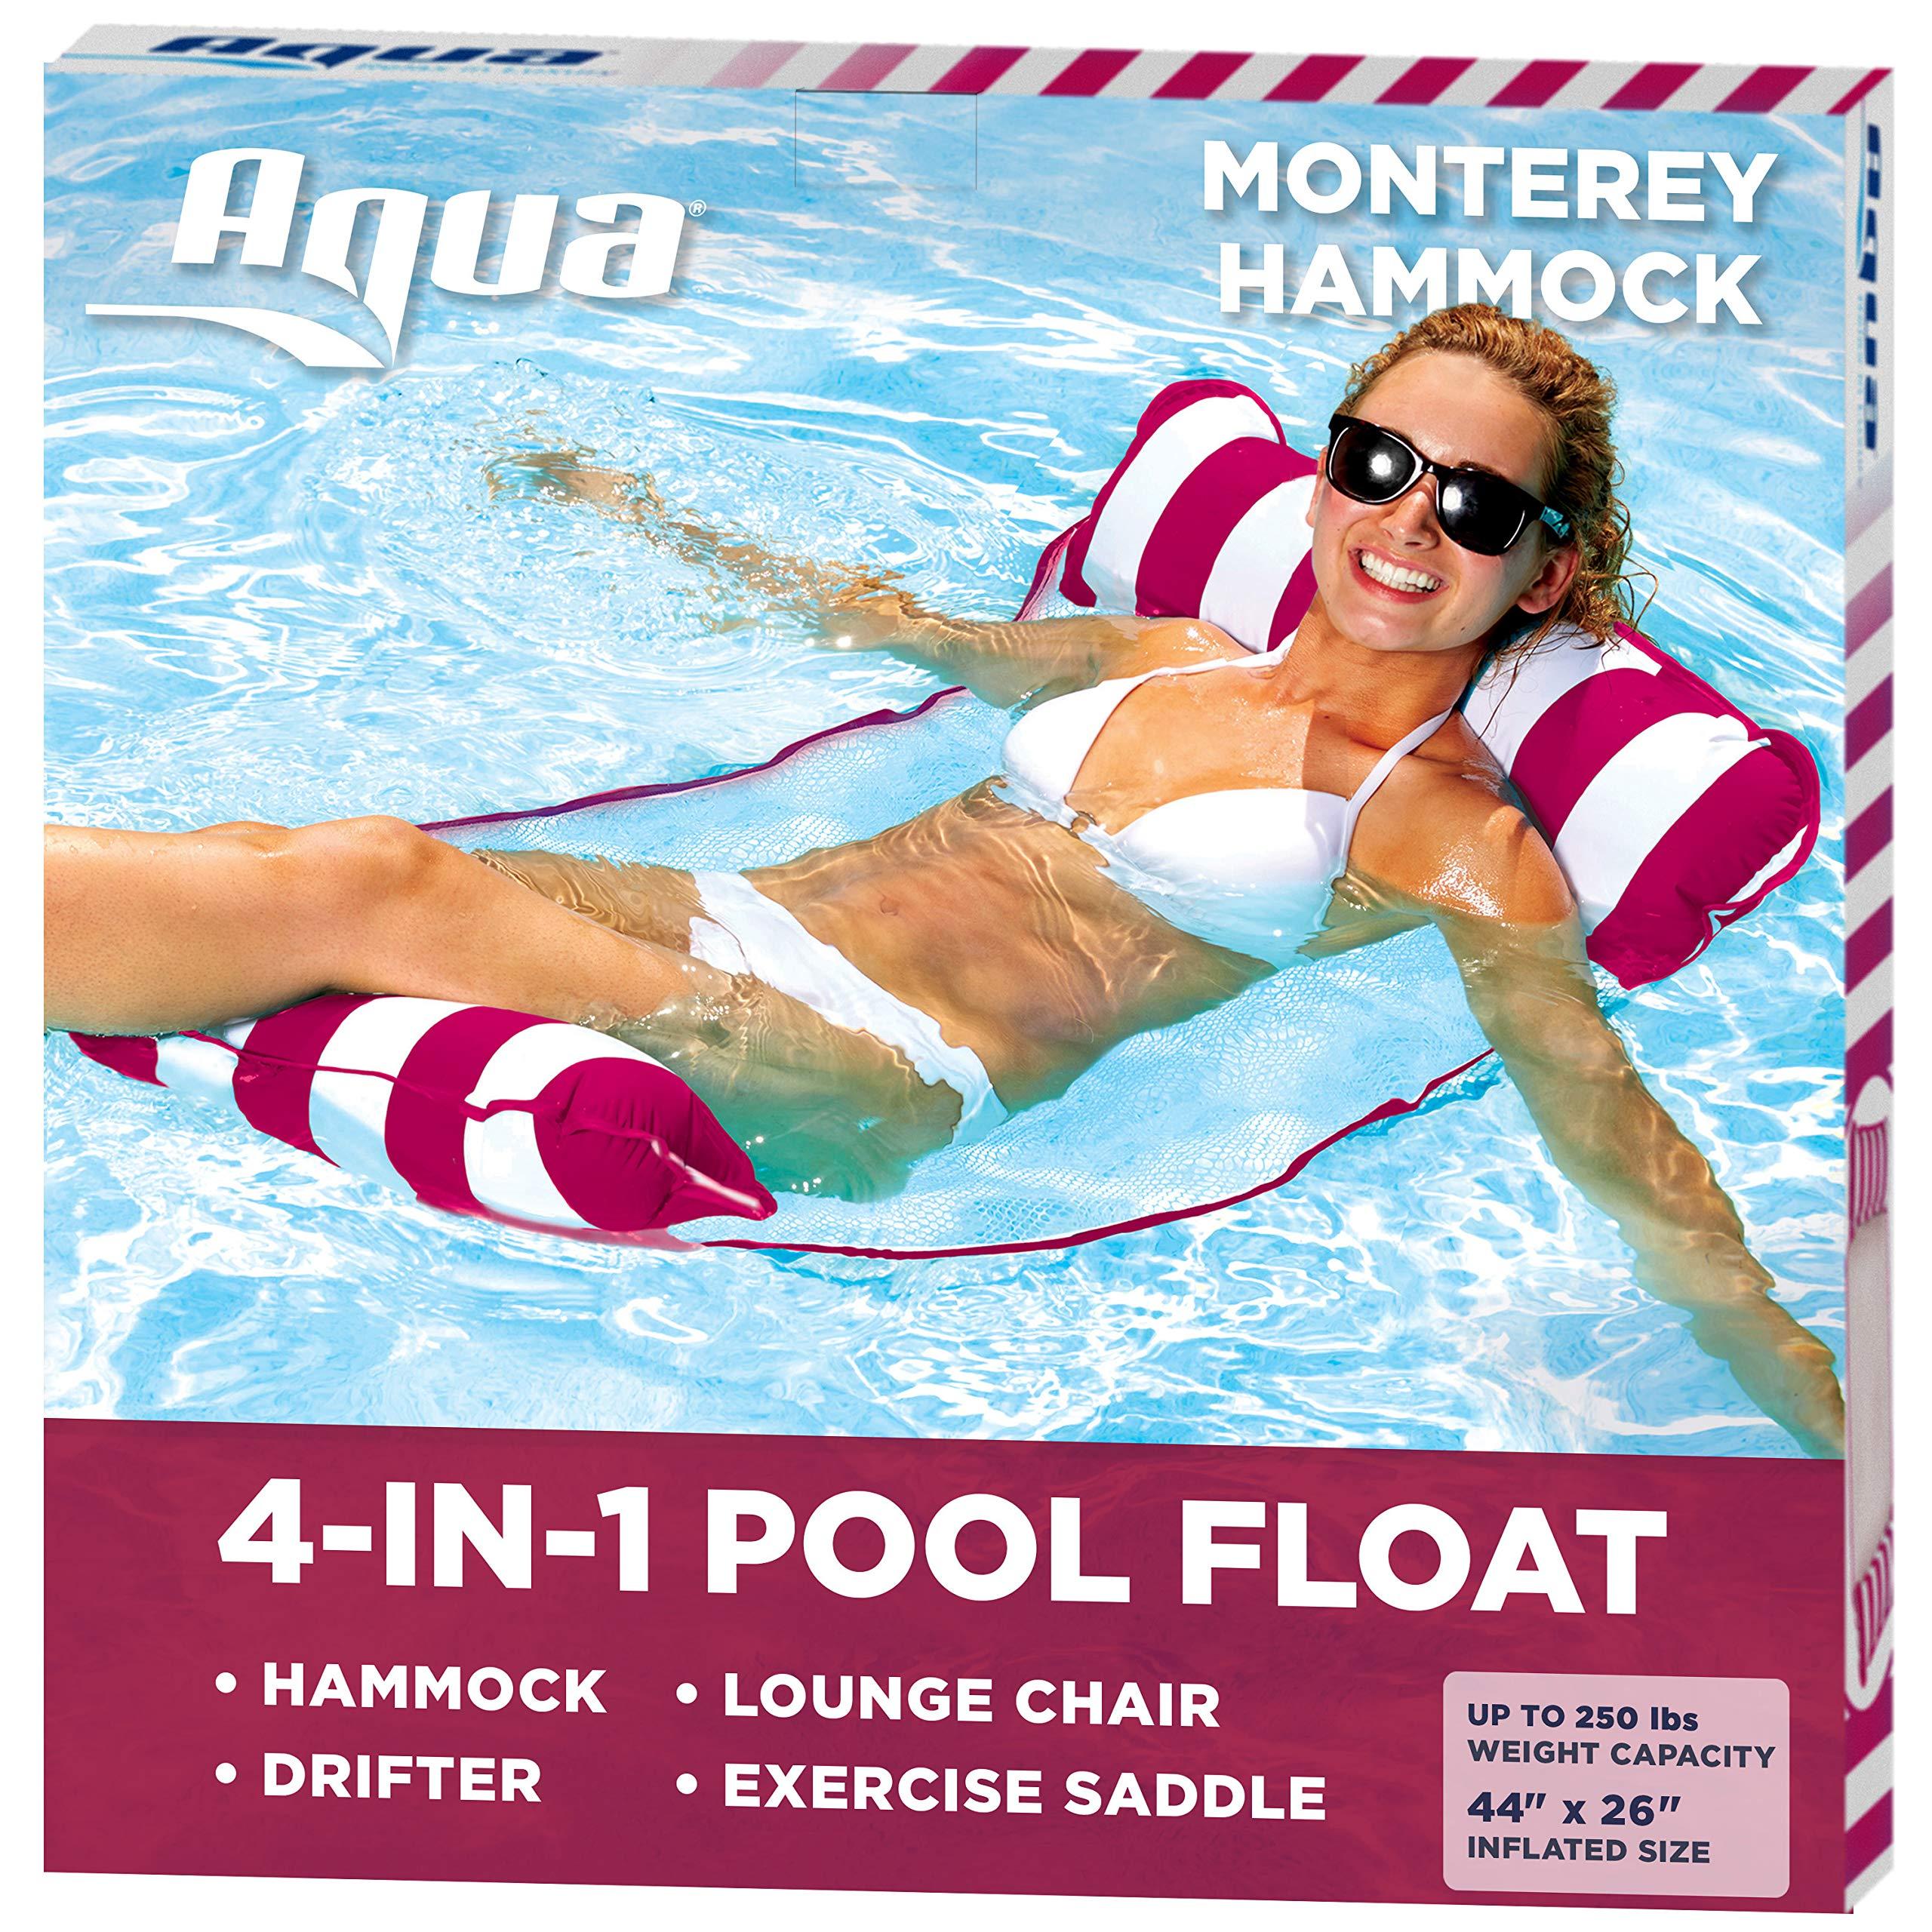 AQUA 4-in-1 Monterey Hammock Inflatable Pool Float Multi-Purpose Pool Hammock (Saddle Lounge Chair Hammock Drifter) Pool Chair Portable Water Hammock Burgundy/White Stripe